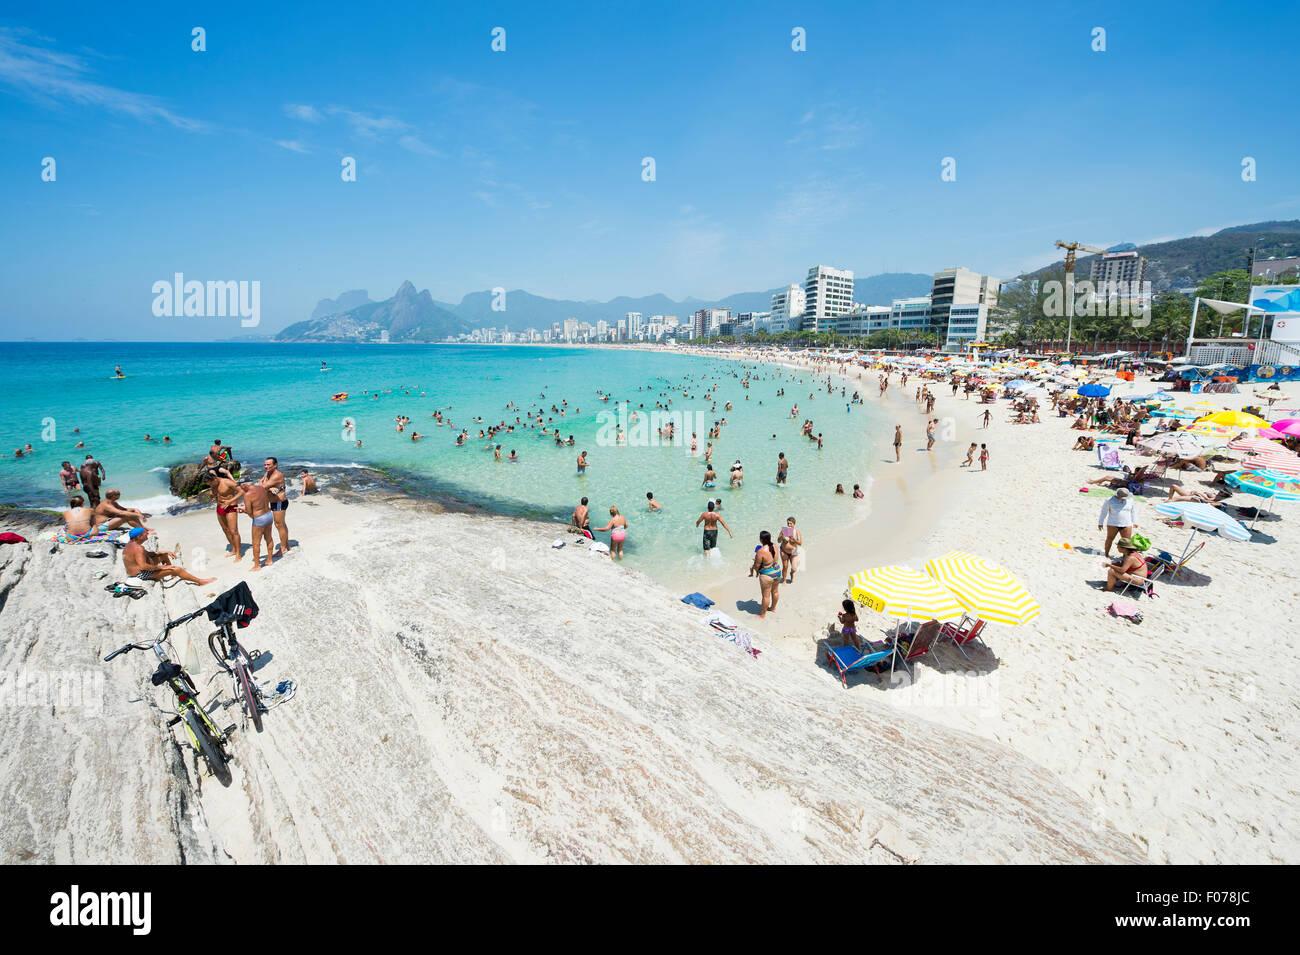 Río de Janeiro, Brasil - Enero 17, 2015: Beachgoers tomar ventaja de la mar en calma en el Arpoador final de Imagen De Stock